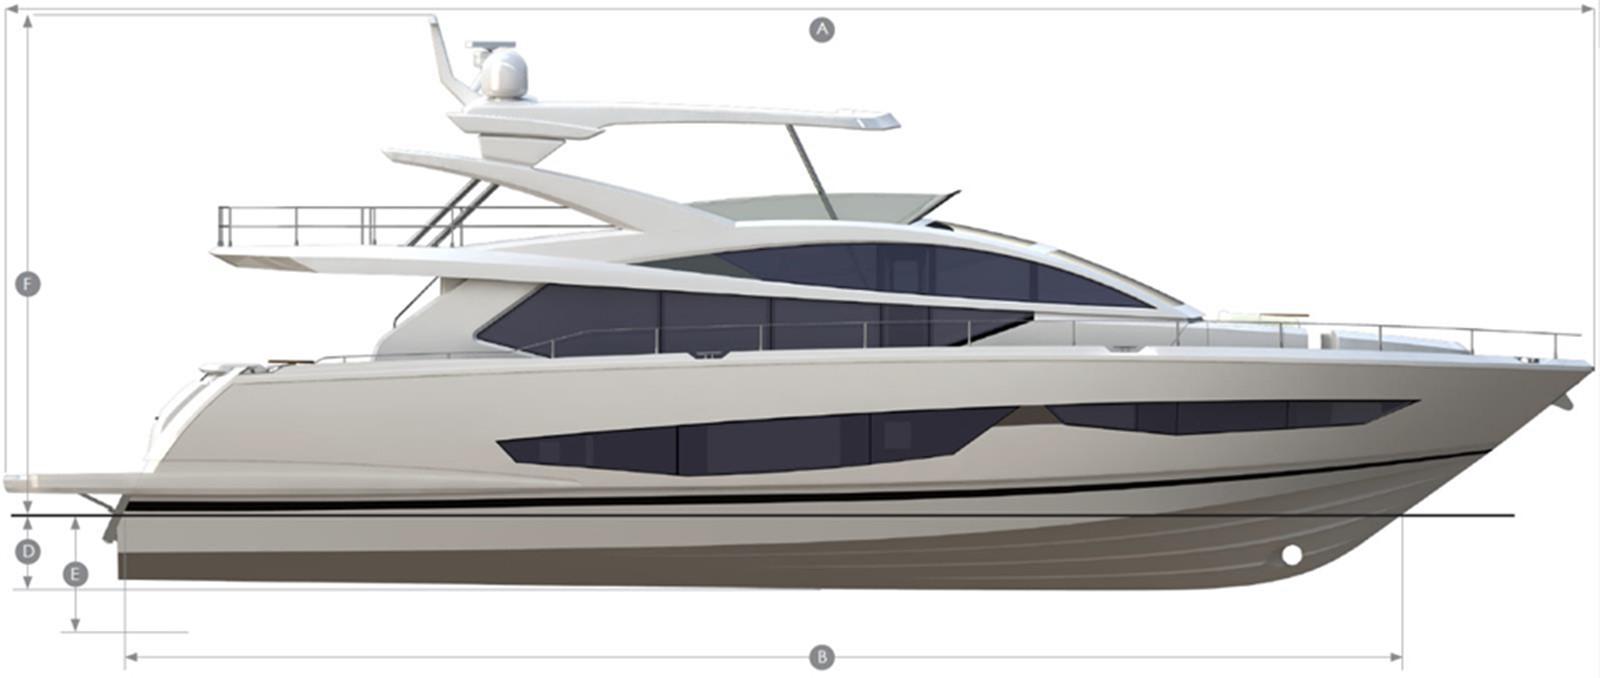 2019 PEARL MOTOR YACHTS Pearl 80 Motor Yacht 2615343